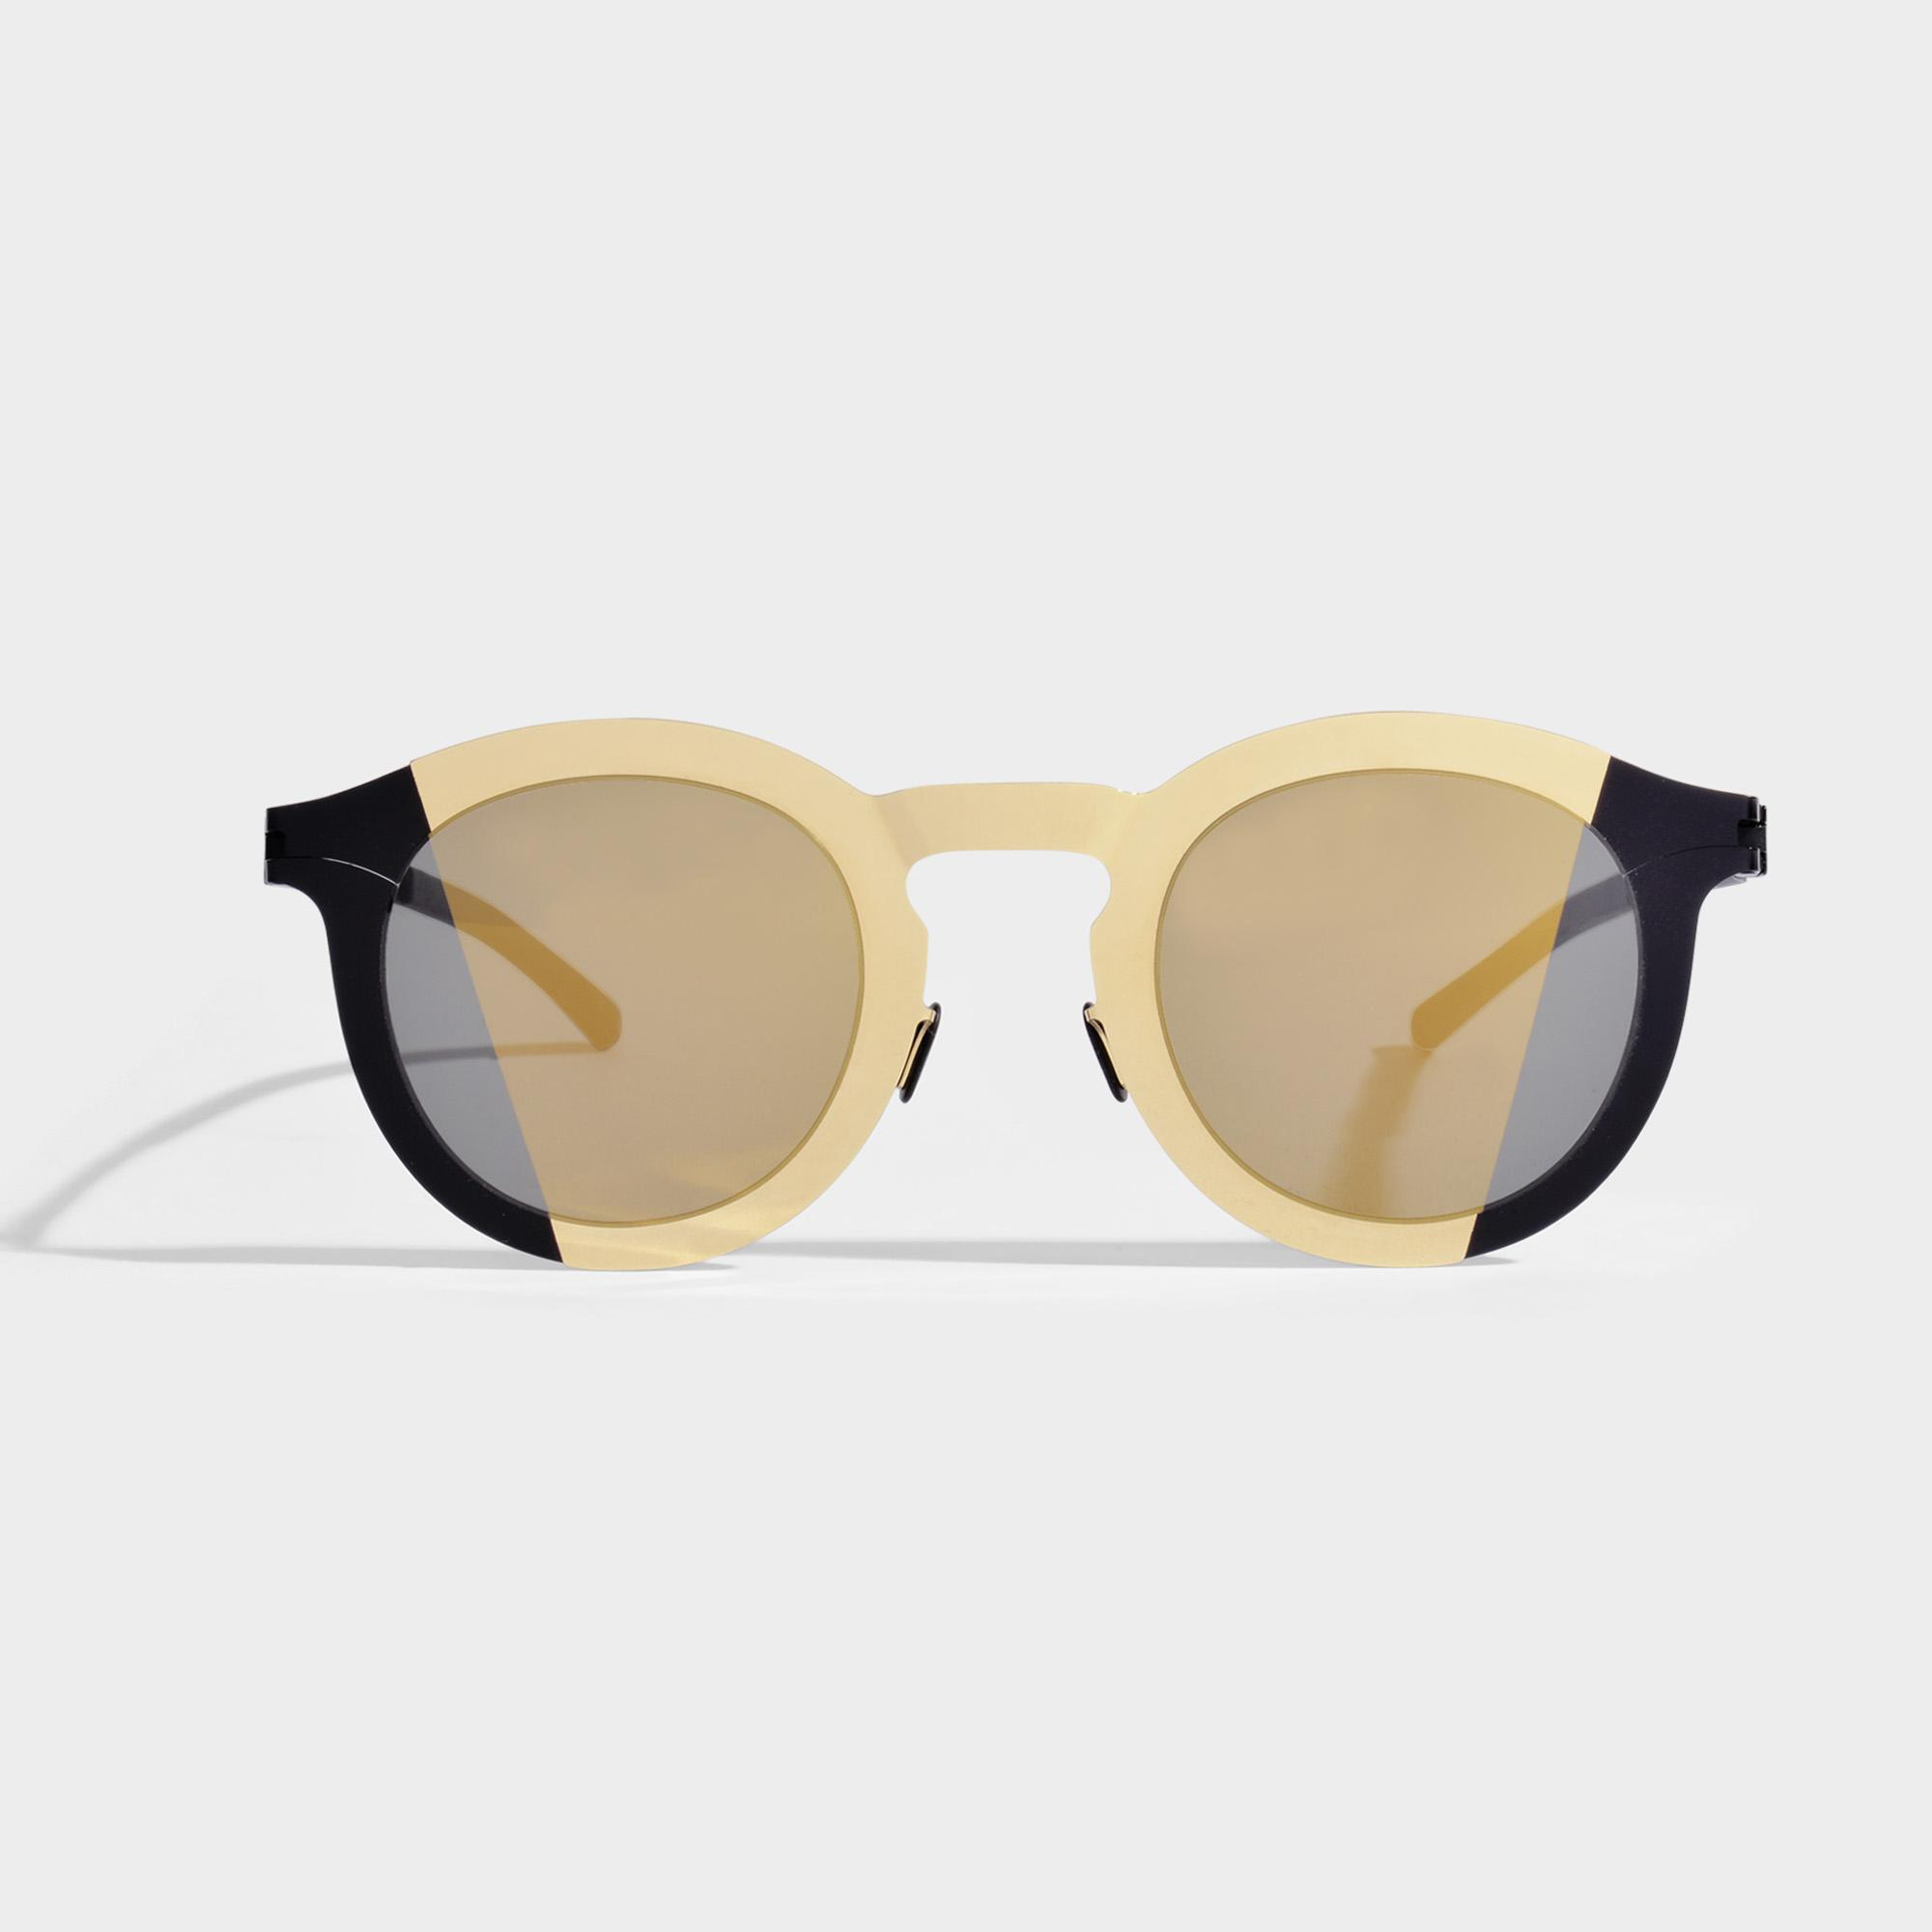 Mykita Studio 2.2 Sunglasses in Gold Black Metal Maison Martin Margiela rpkN5iR